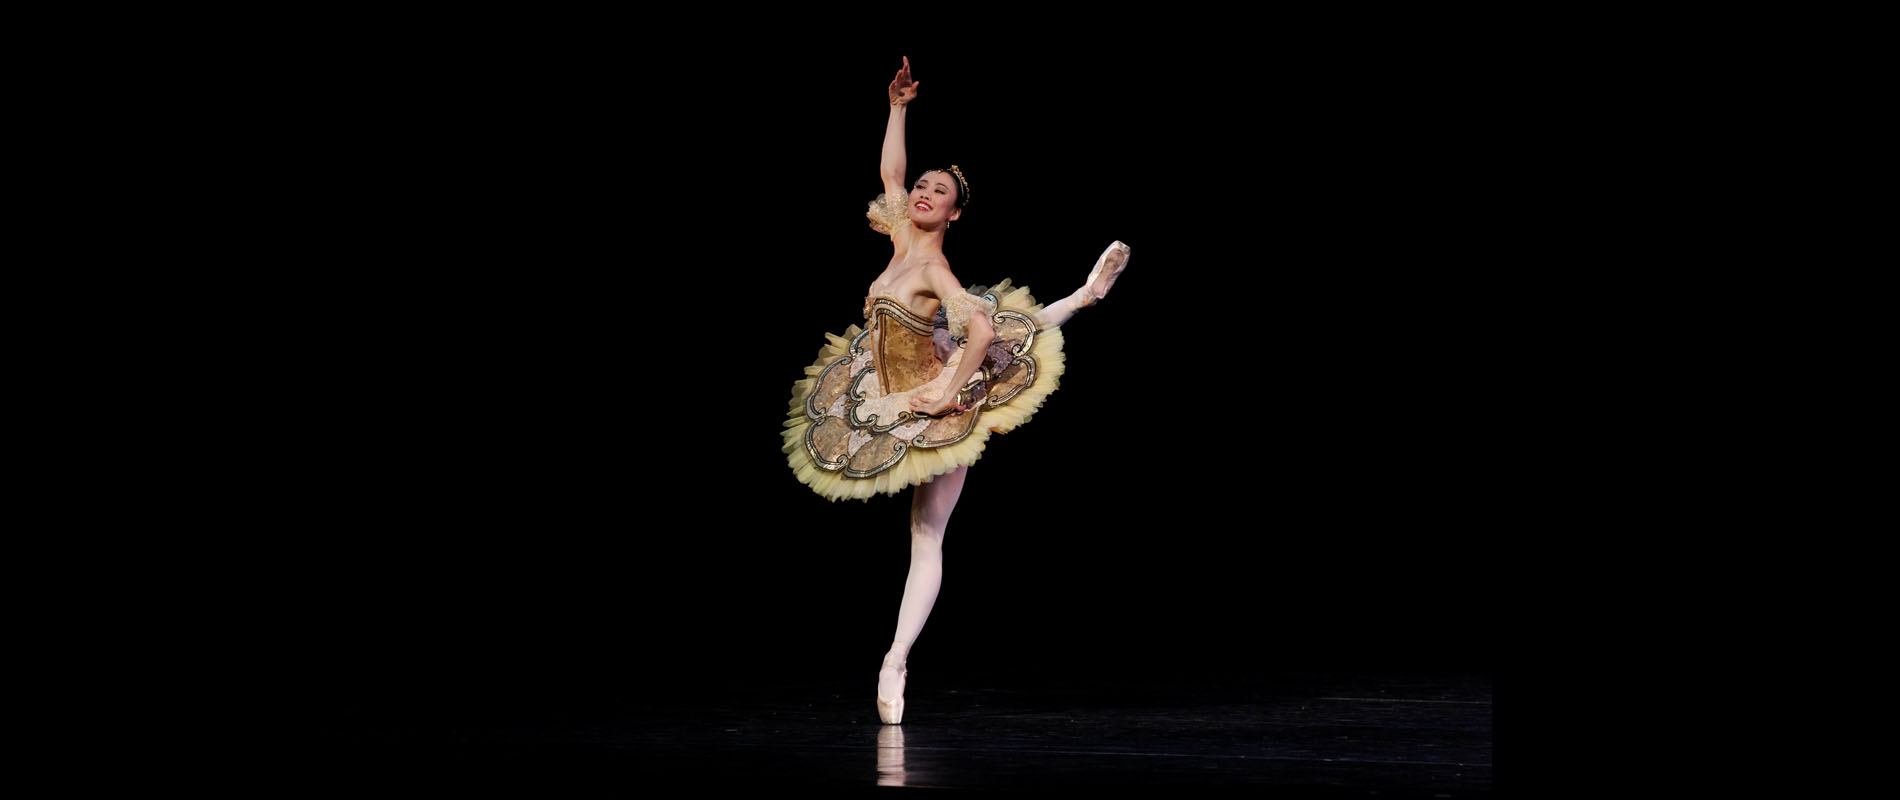 slider4-kursus-balet-pekanbaru-enpointe